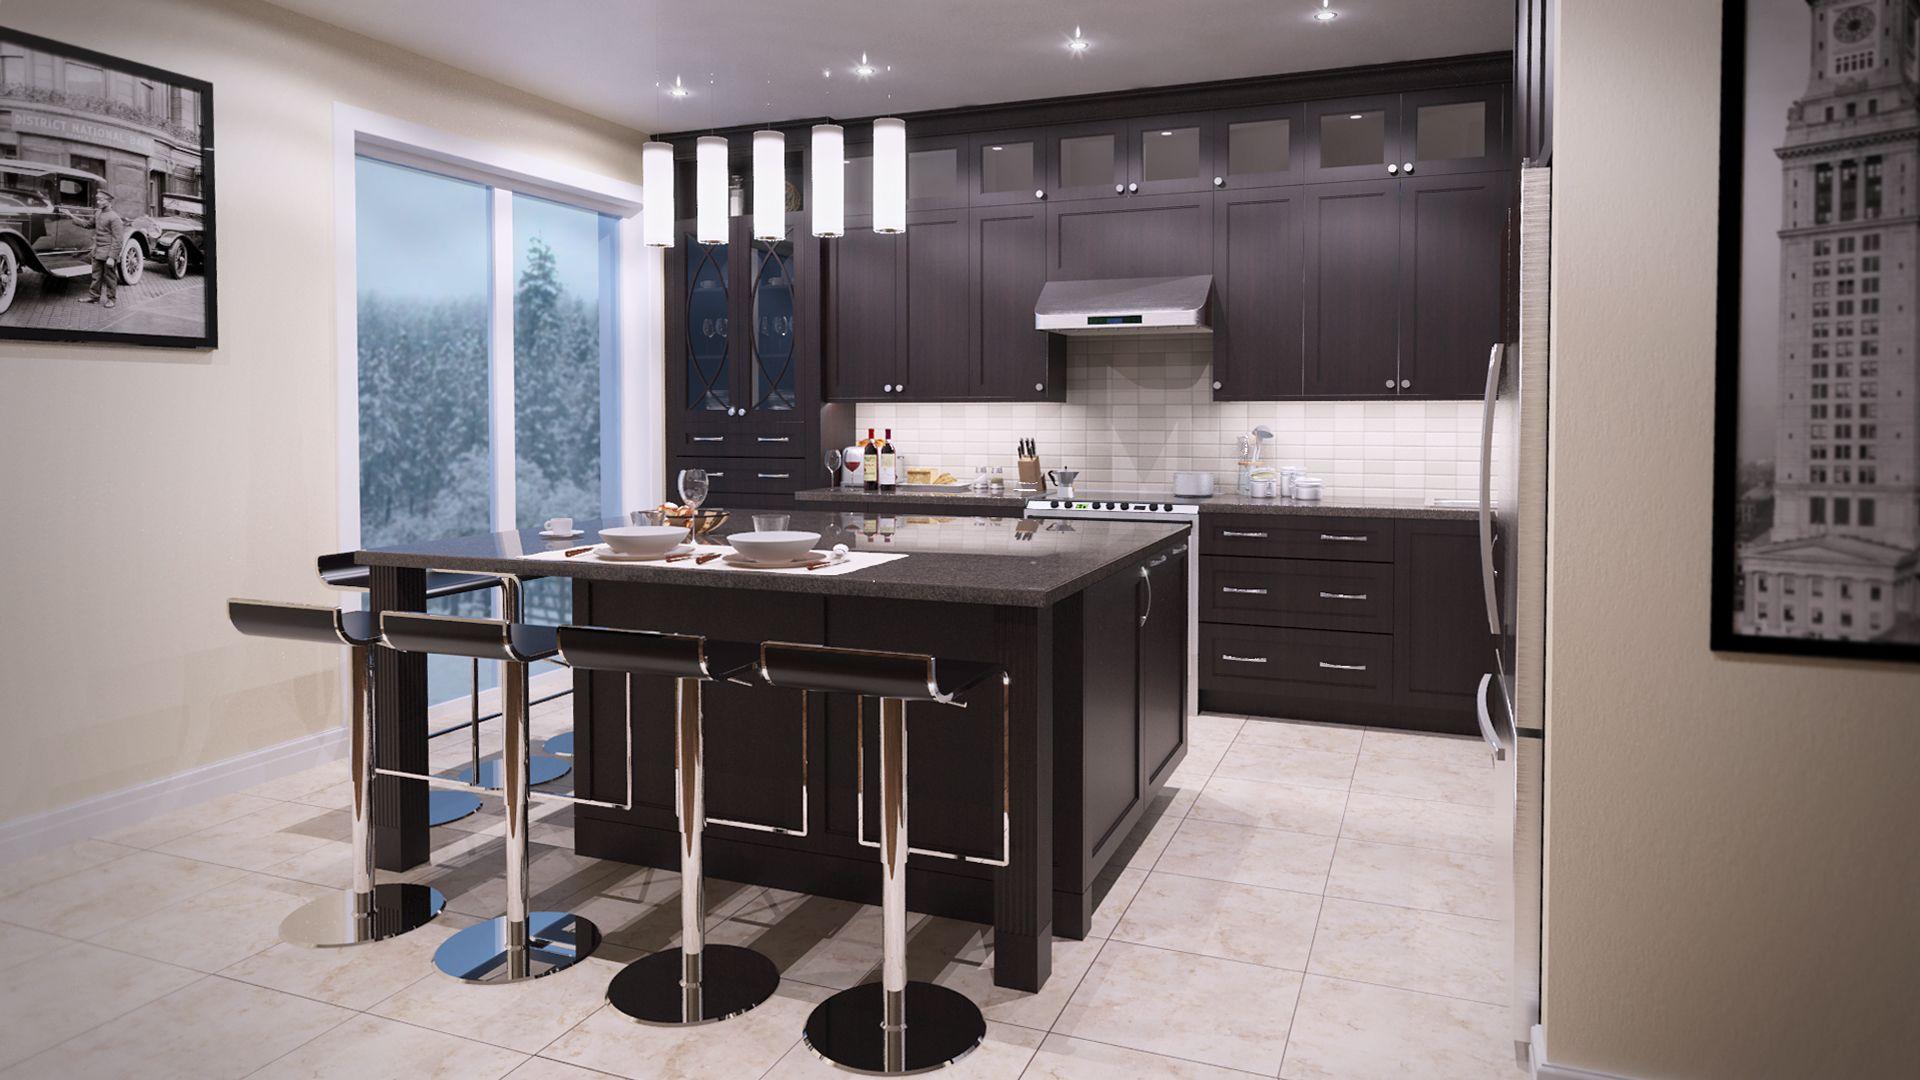 Kitchen Design L Shape Medium Size With One Big Island Design By Www Smanzerdesign Com Contemporary Kitchen Design Kitchen Design Contemporary Kitchen Medium sized kitchen designs